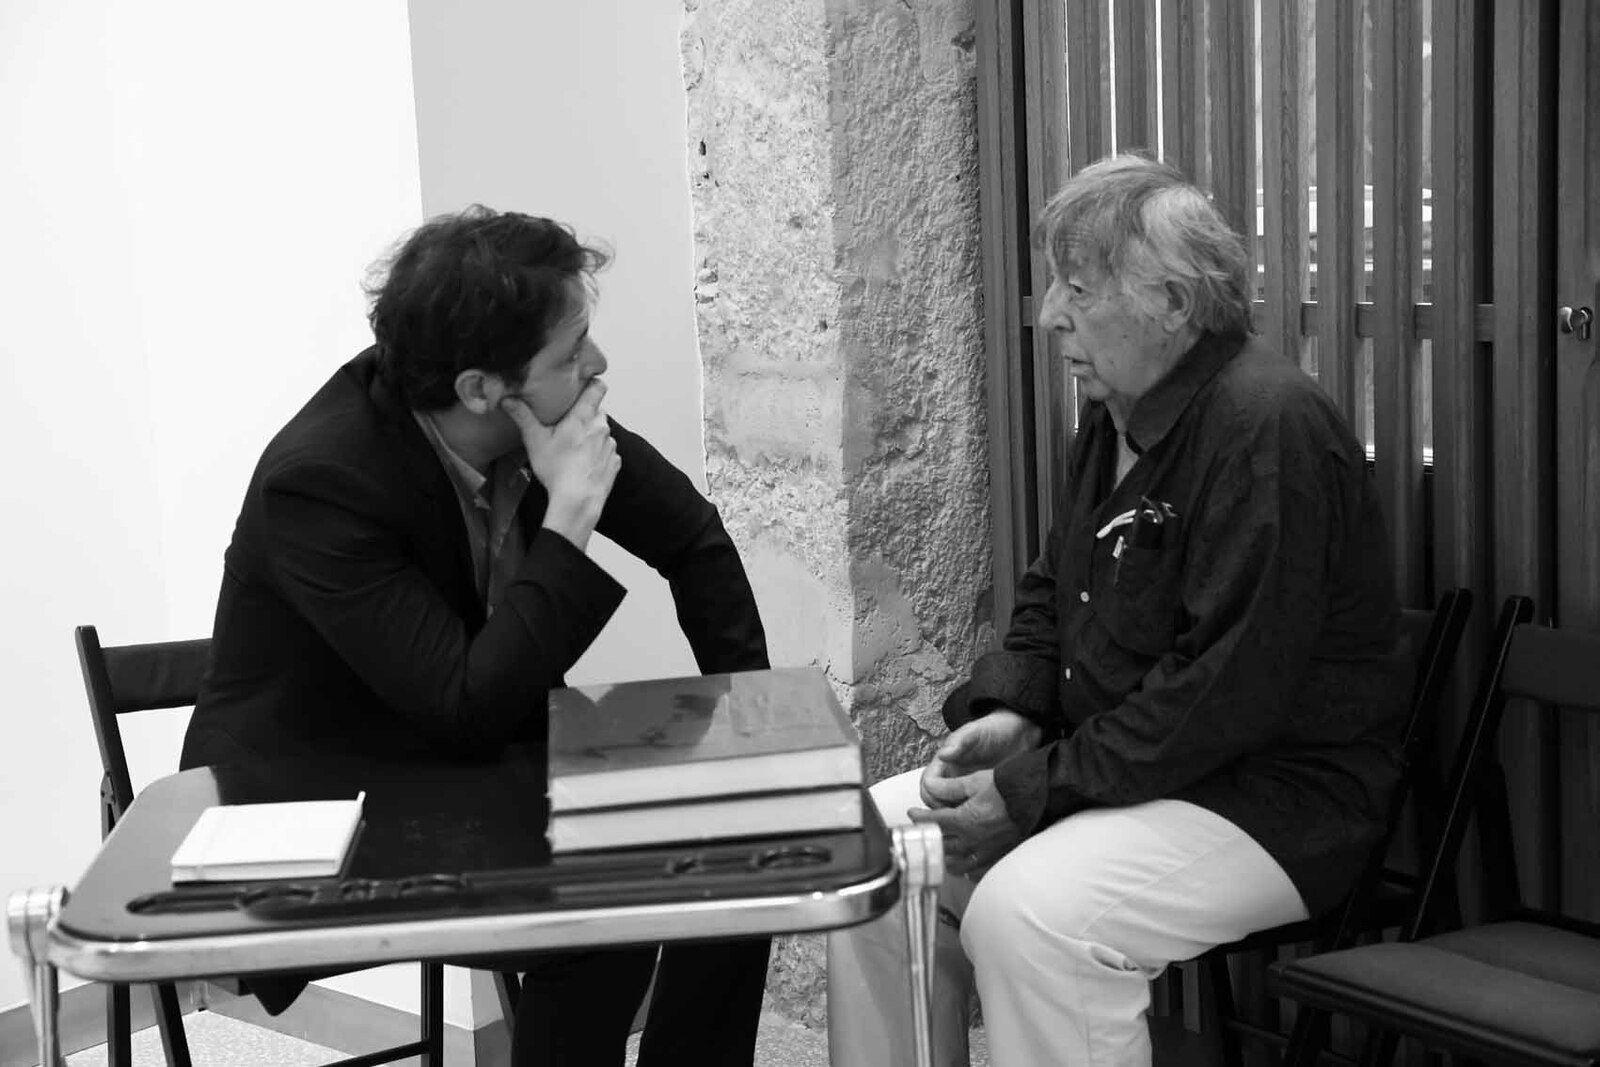 Loïc Bénétière, Claude Viallat